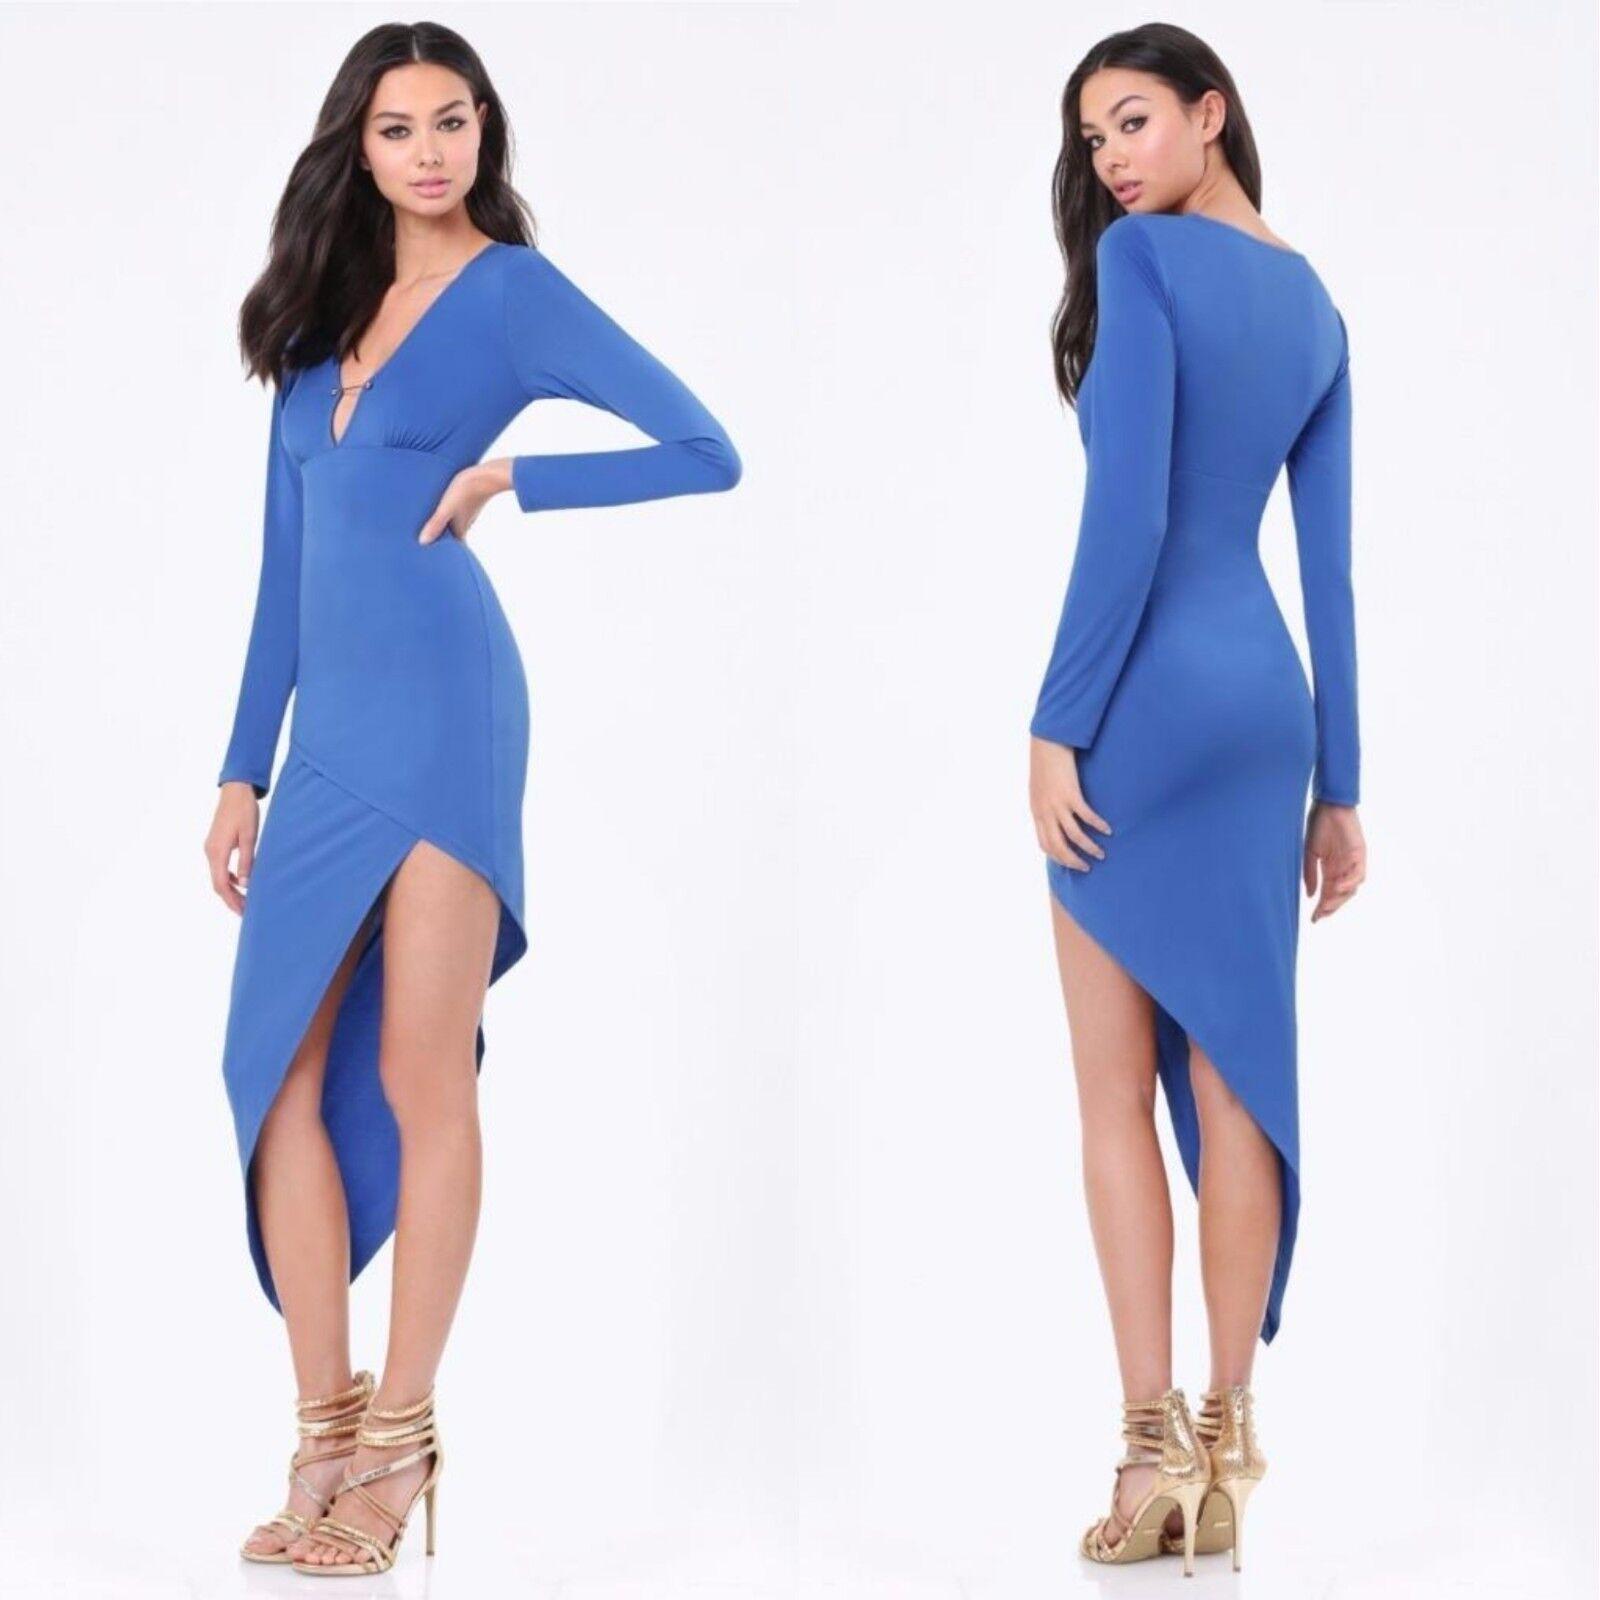 BEBE blueE BLAZE ASYMMETRIC DRESS NEW NWT  SMALL S